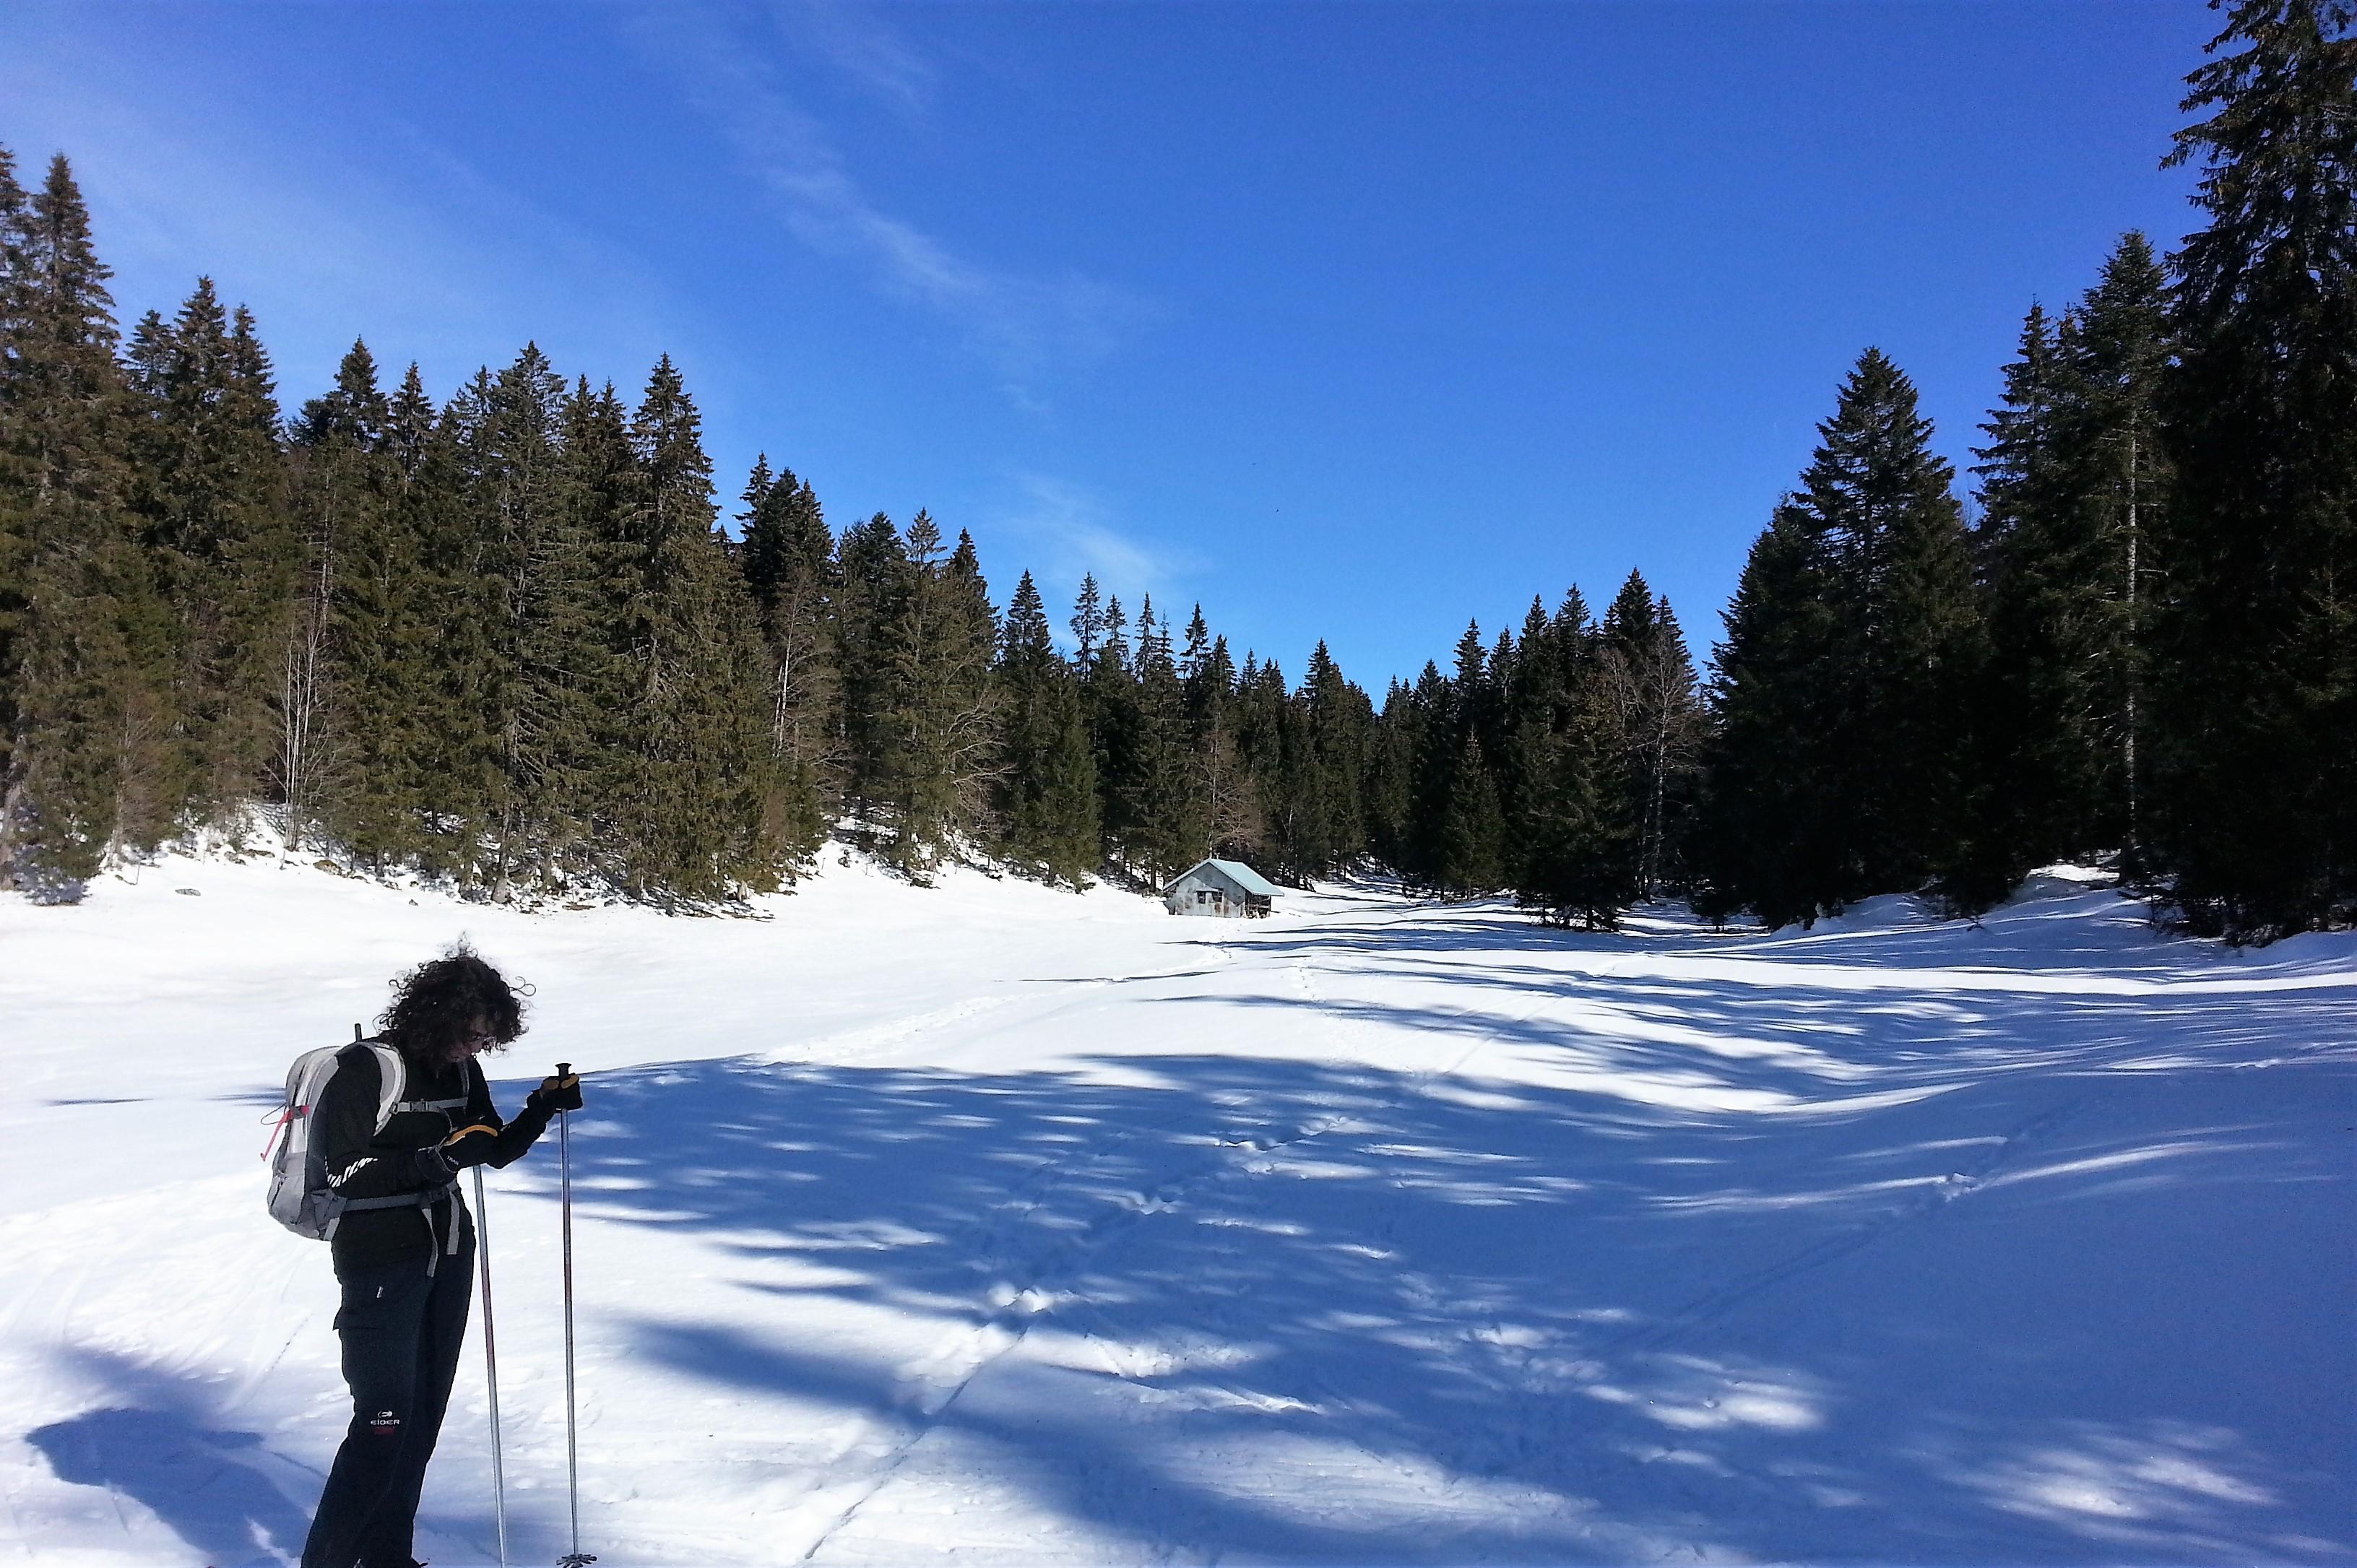 20150220 121955 2 Raquette à neige